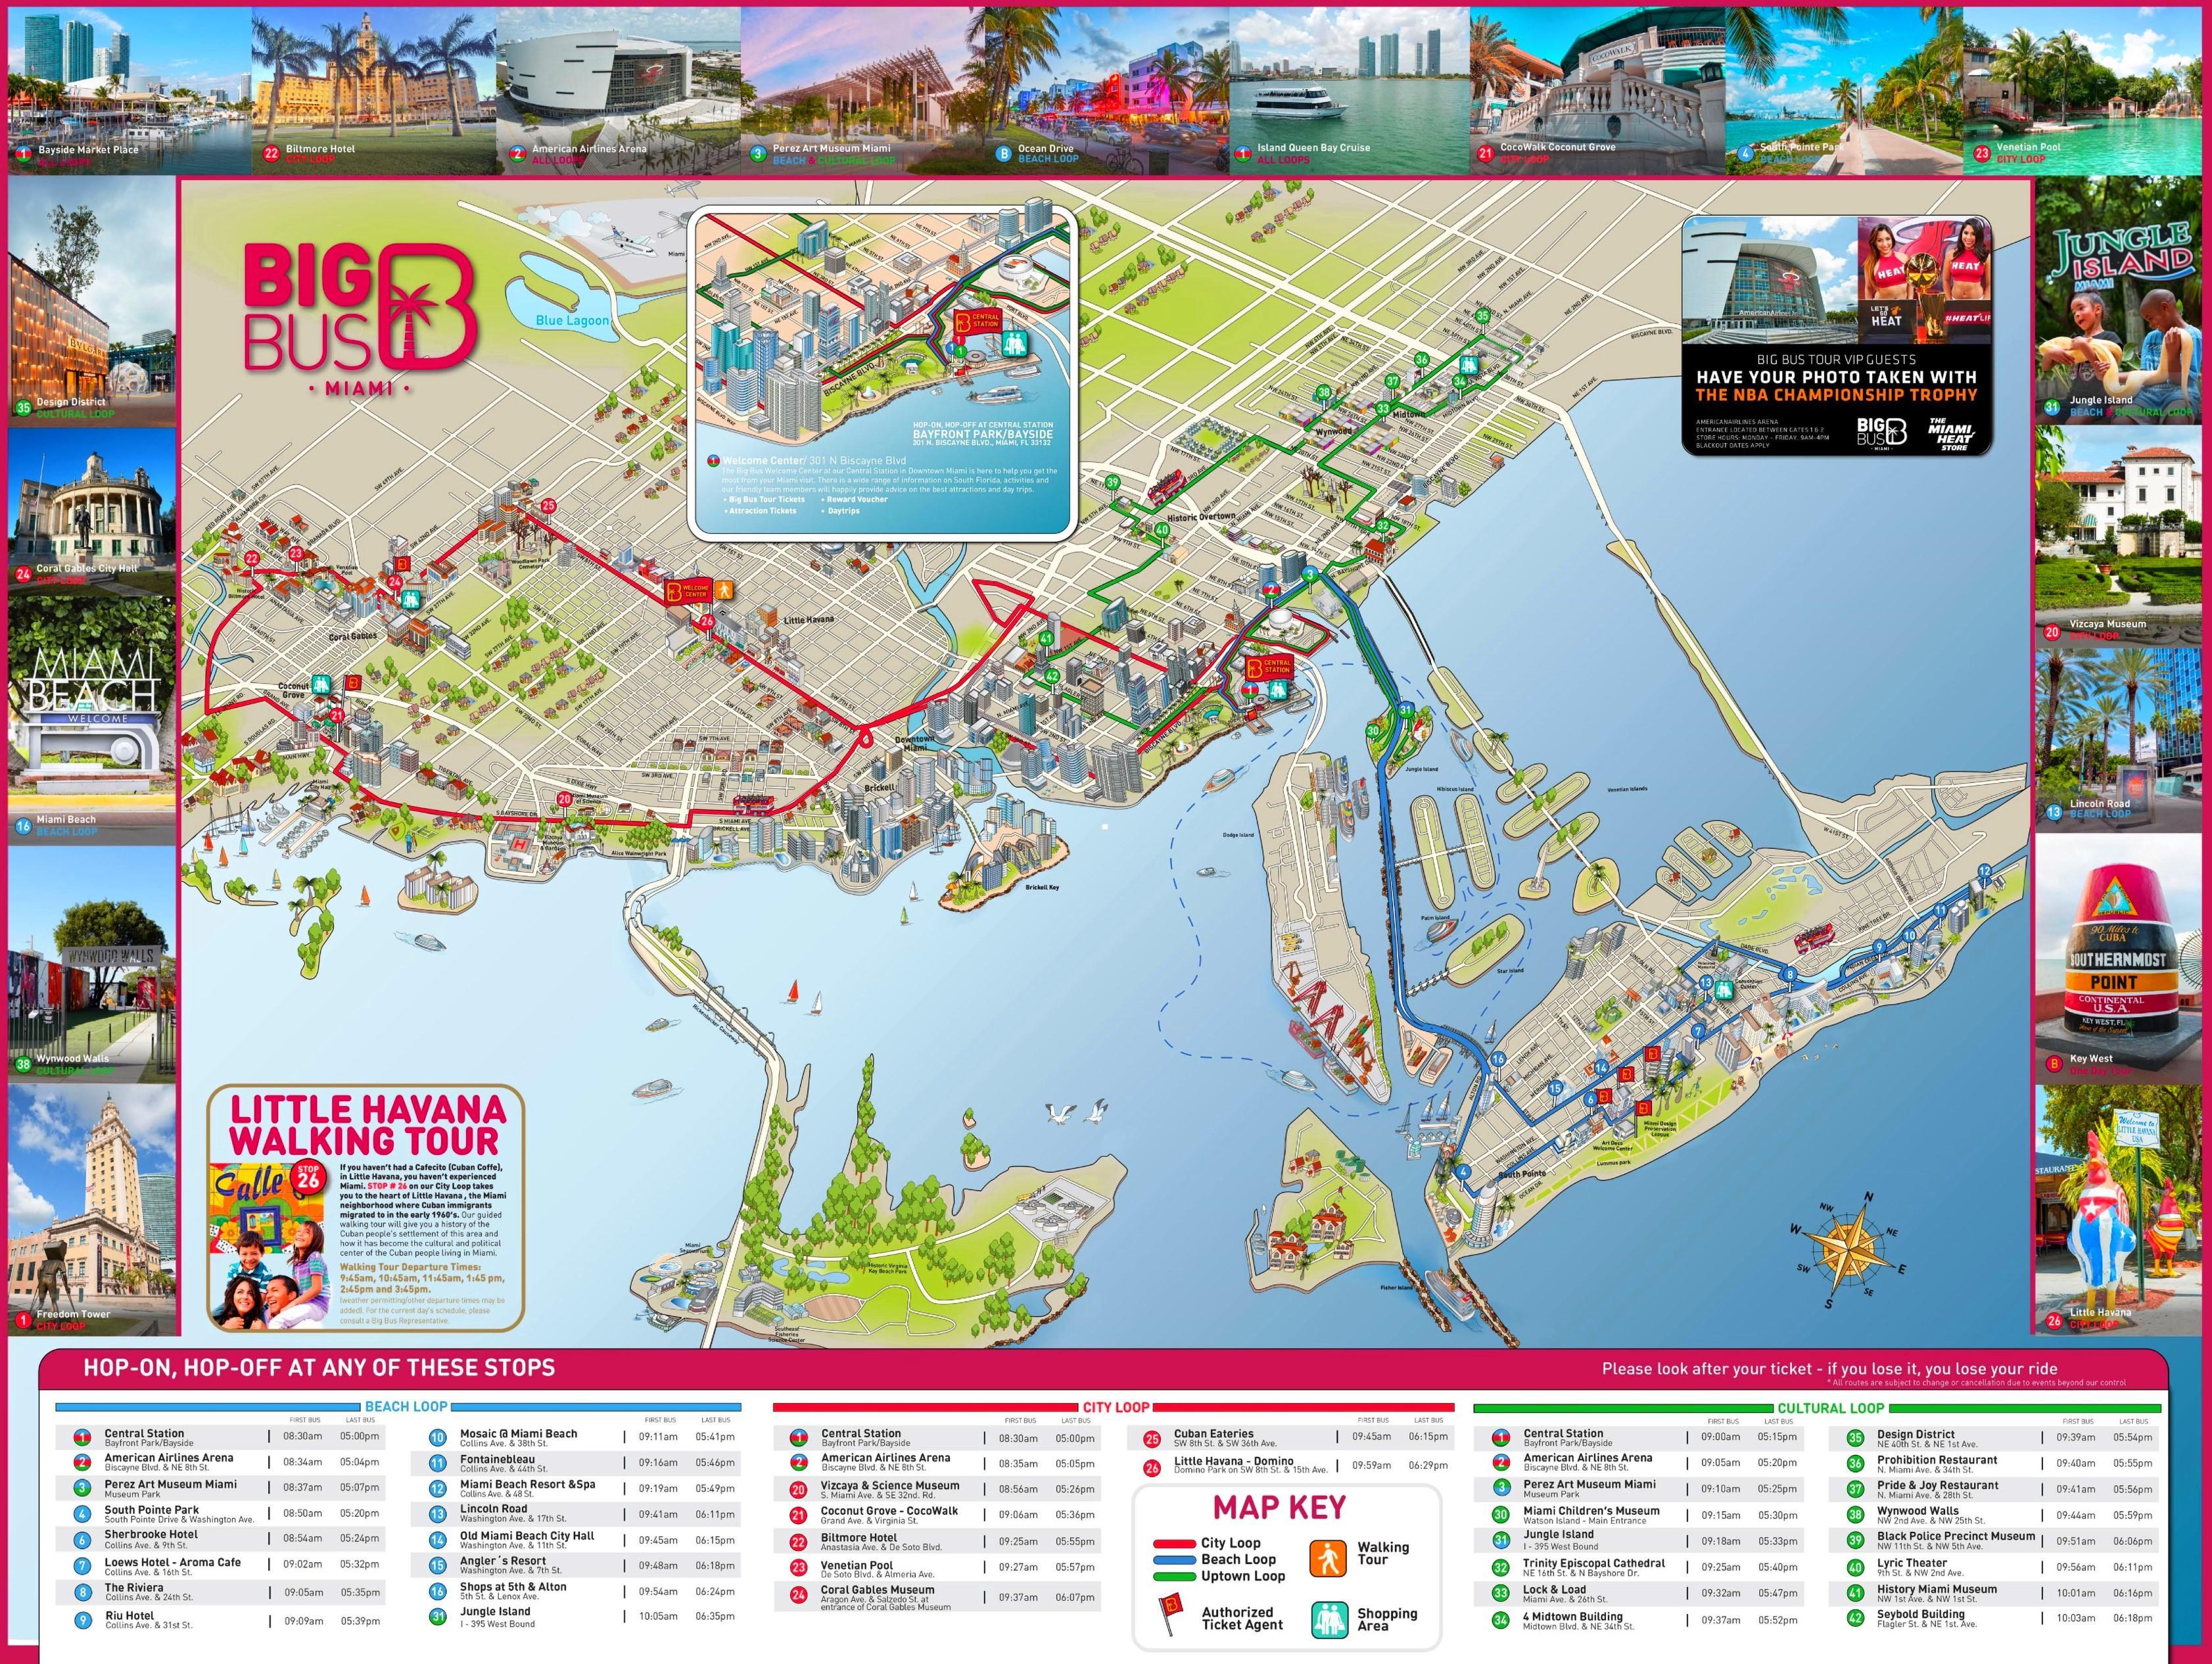 miami turismo mapa - cidade de turismo miami mapa (florida